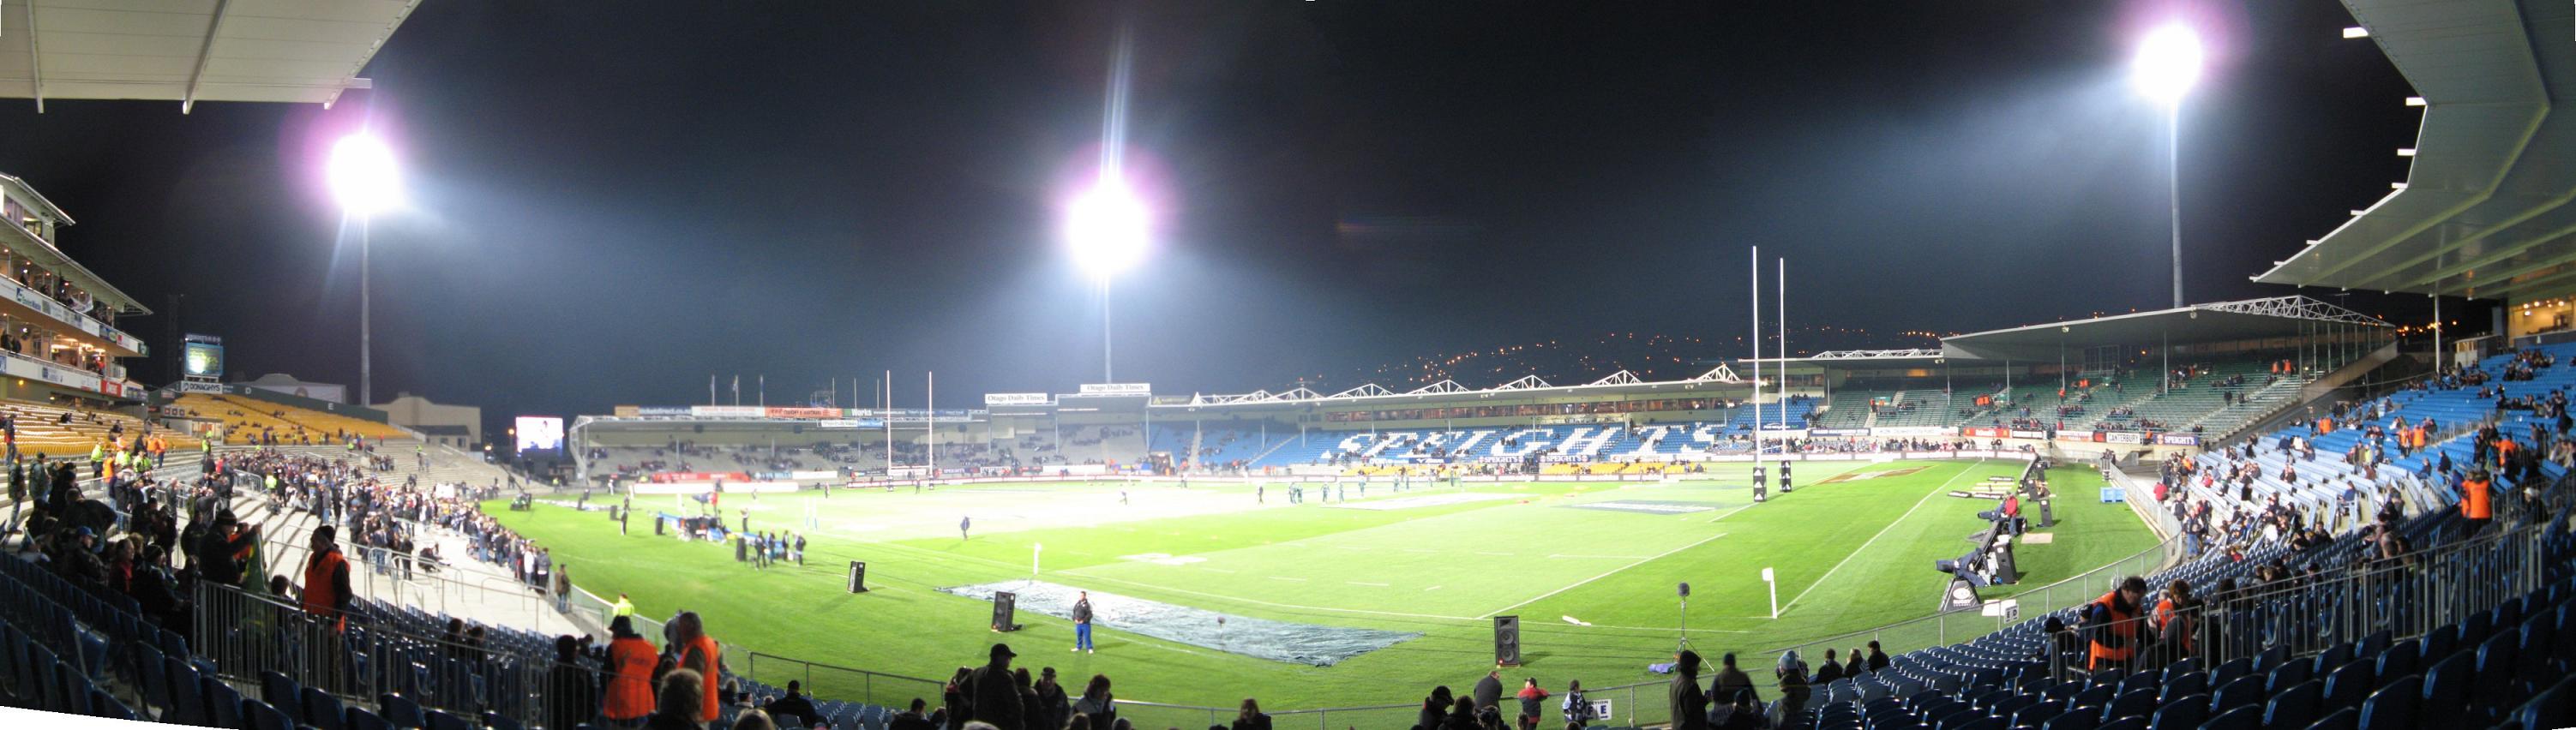 Carisbrook Stadium Dunedin